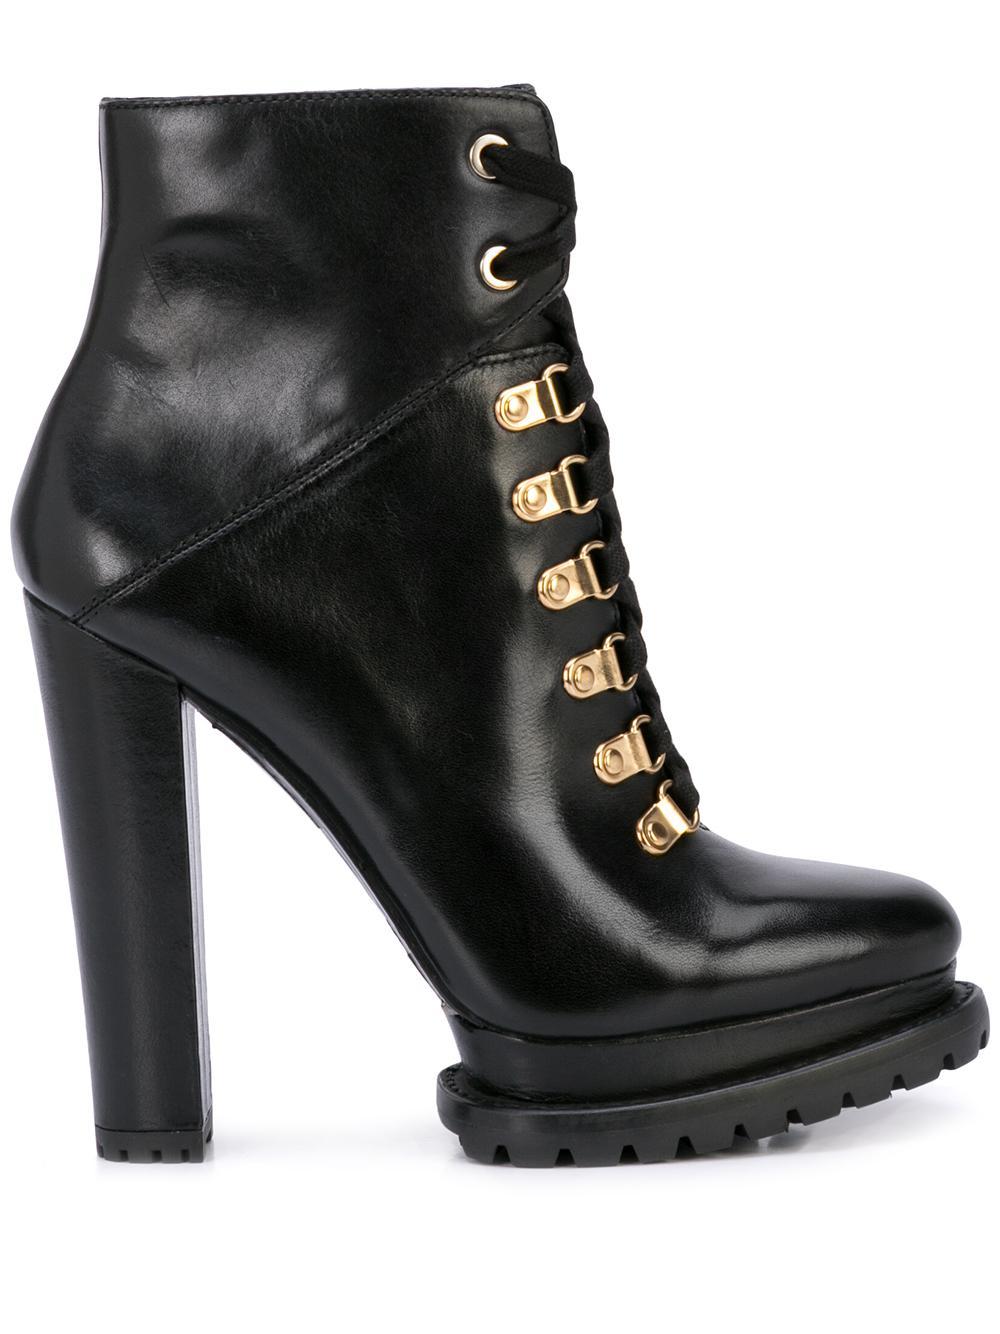 Leather Lace Up Bootie W/Block Heel Item # JESNA